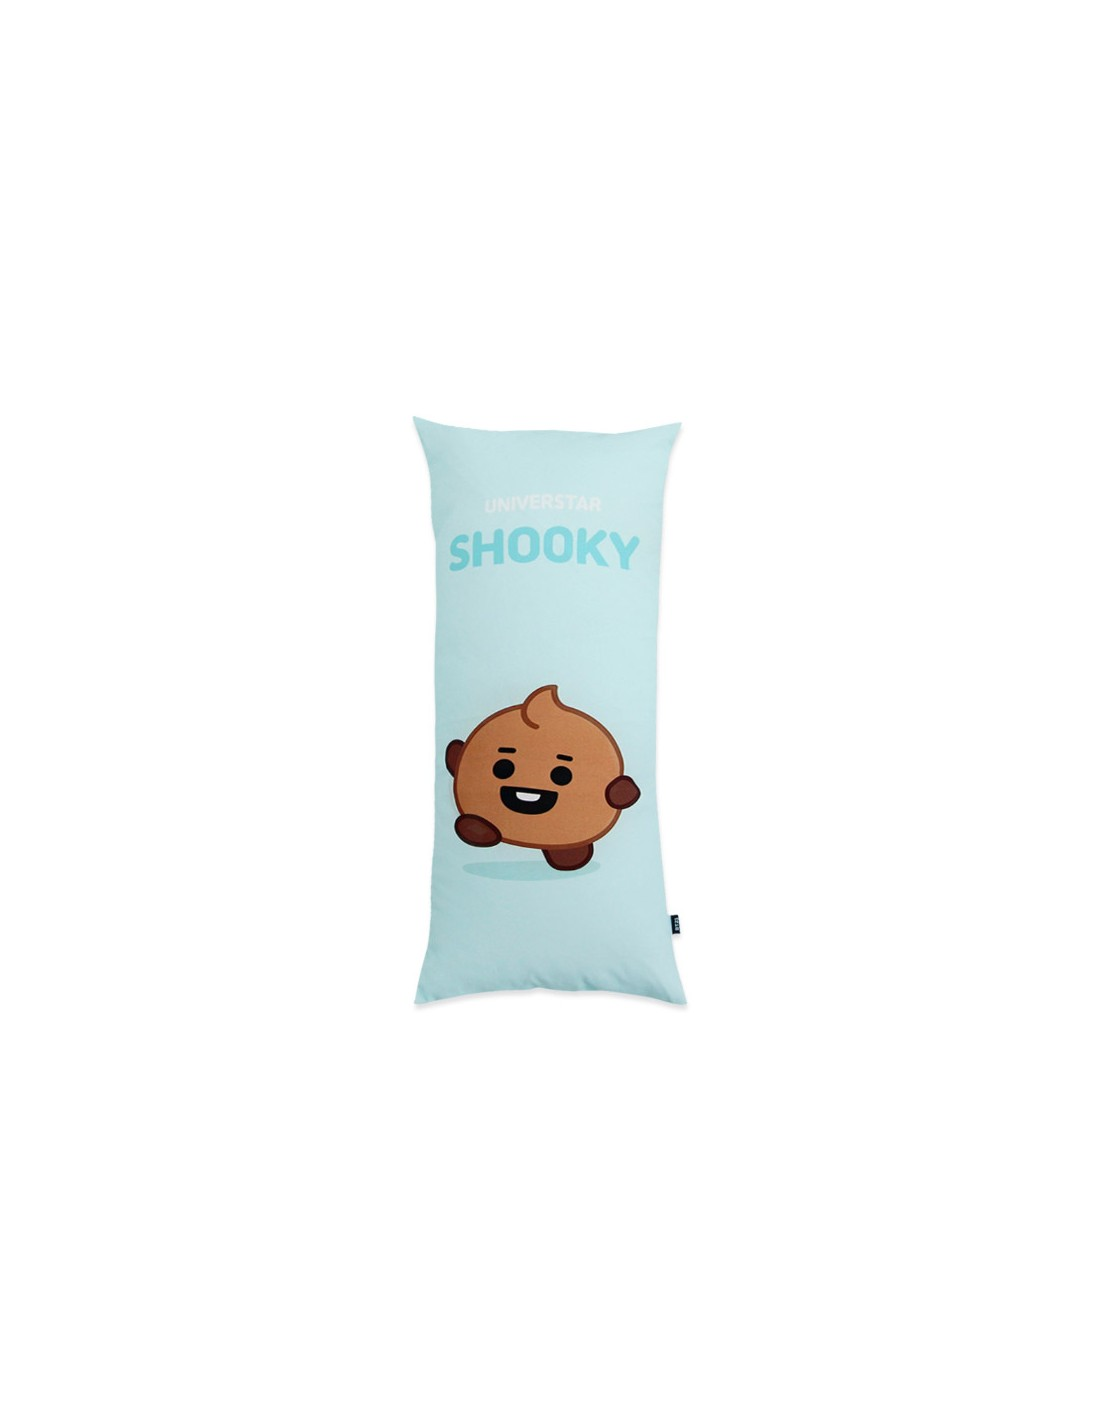 bt21 bts nara home deco collaboration baby body pillow